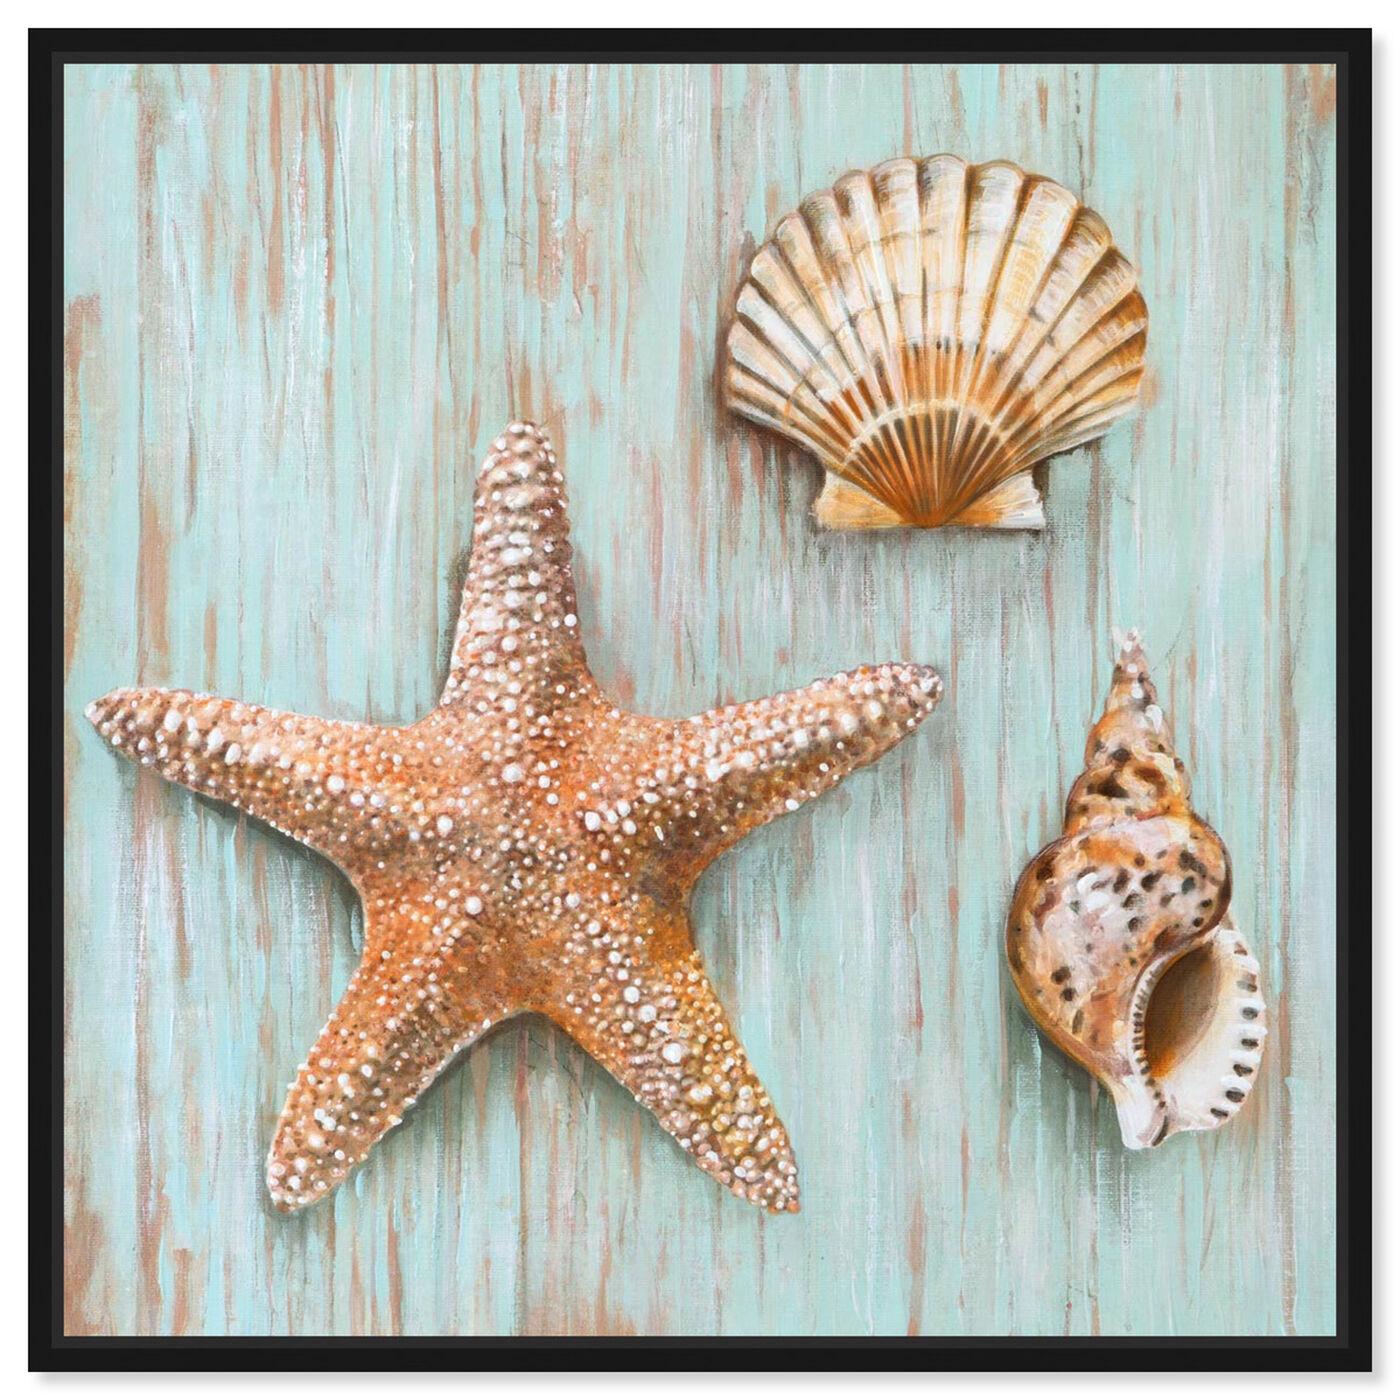 Front view of SAI - Maritimas Treasures featuring nautical and coastal and marine life art.